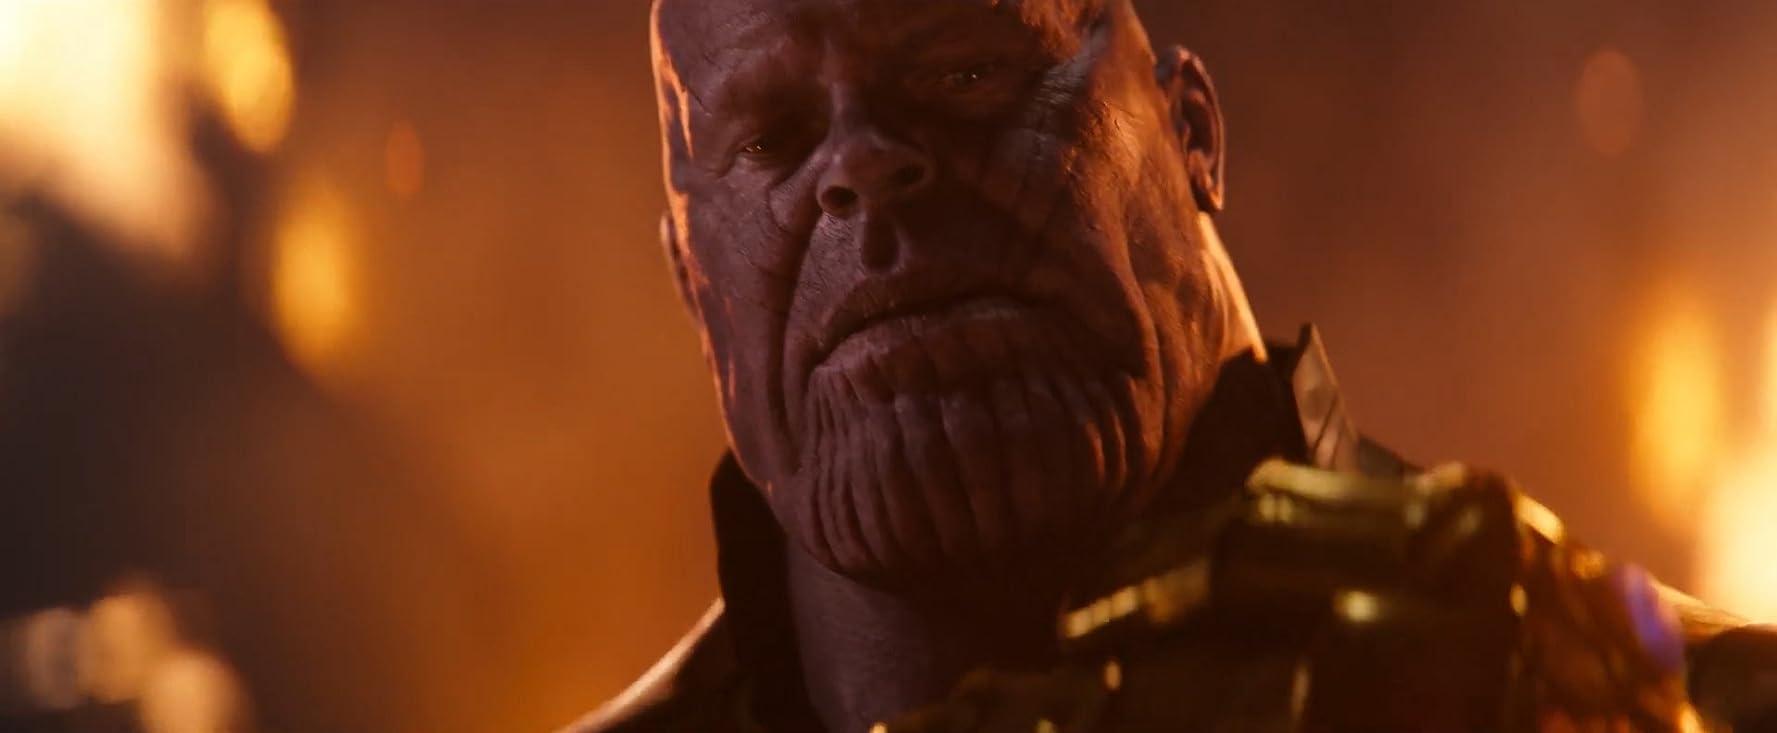 Josh Brolin as Thanos / Avengers: Infinity War / IMDB.com